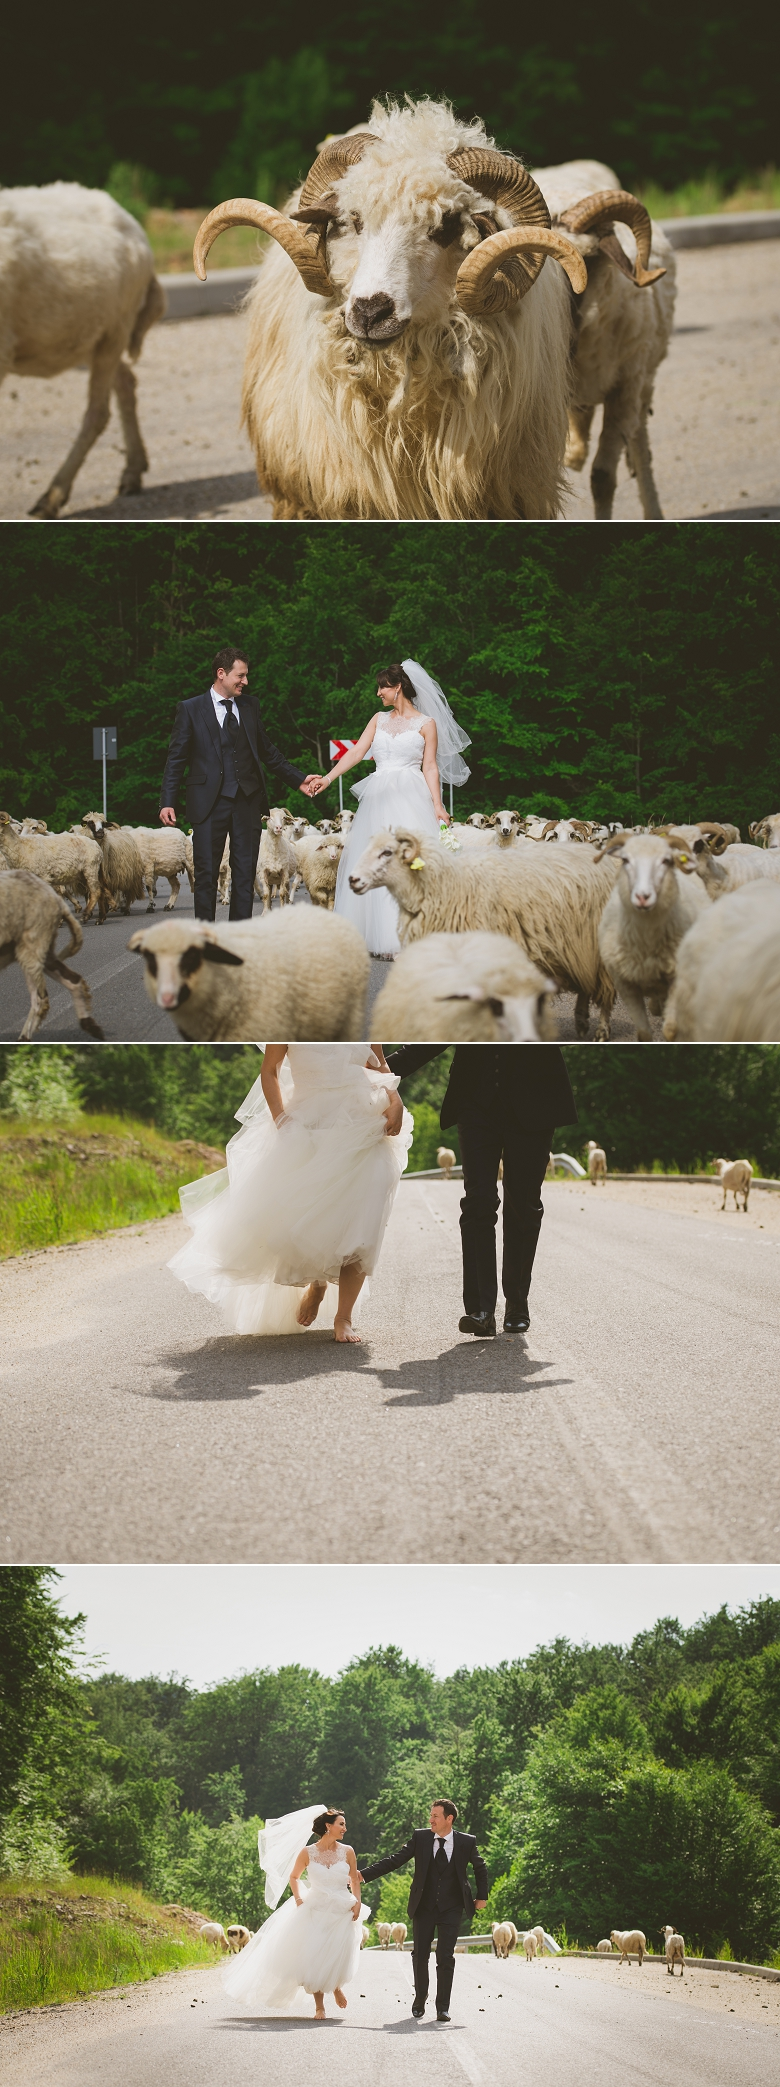 sedinta_foto_dupa_nunta_negresti_satu_mare_after_weeding_satu_mare_trash_the_dress_satu_mare 5